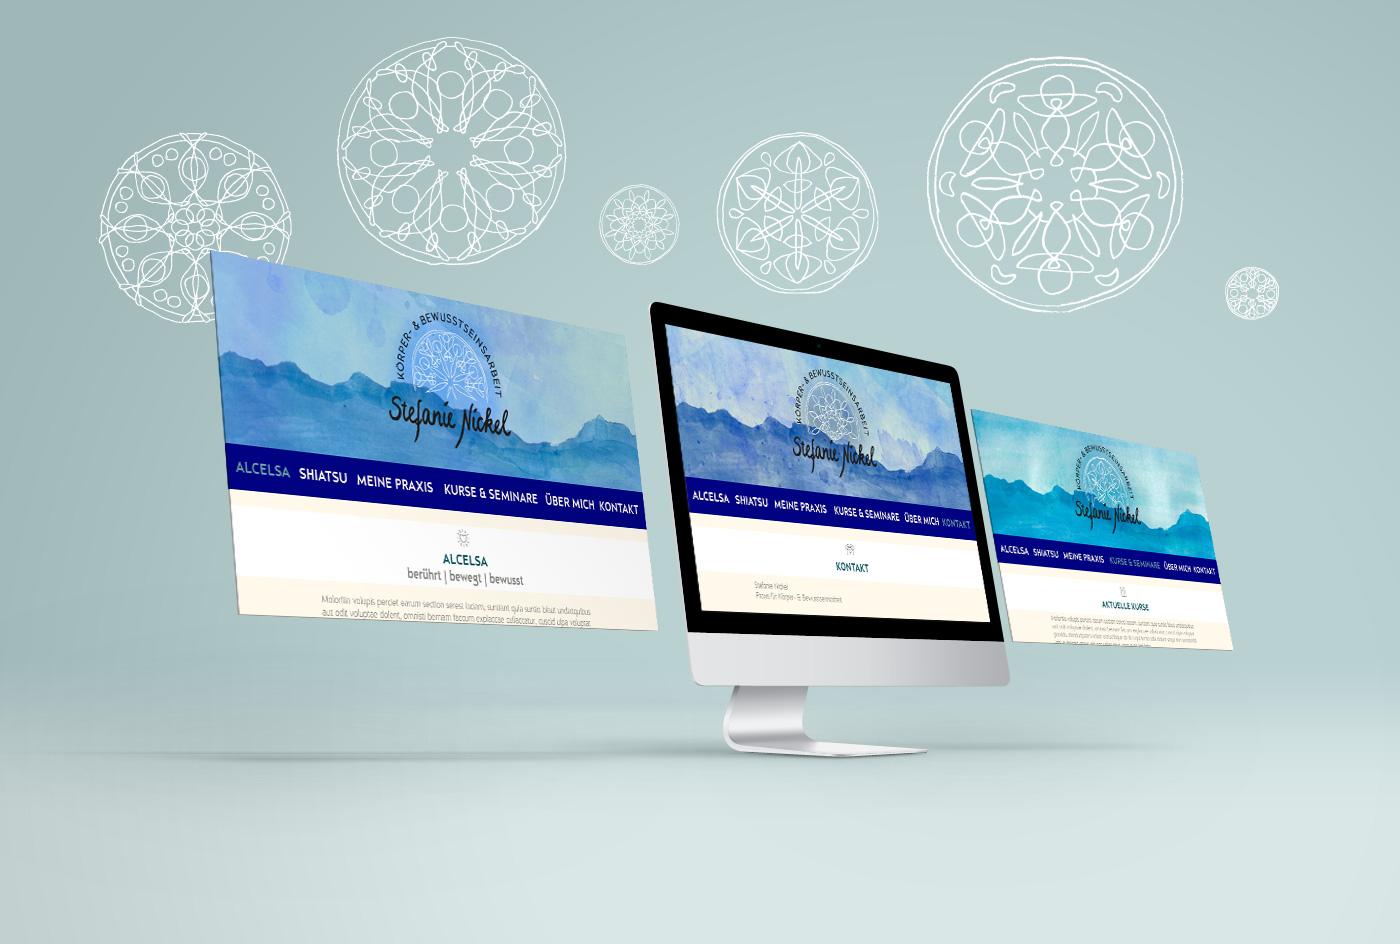 Stefanie Nickel Alcelsa® Schweiz Chur Obersaxen Webdesign Grafik Design Marina Grimme Augsburg